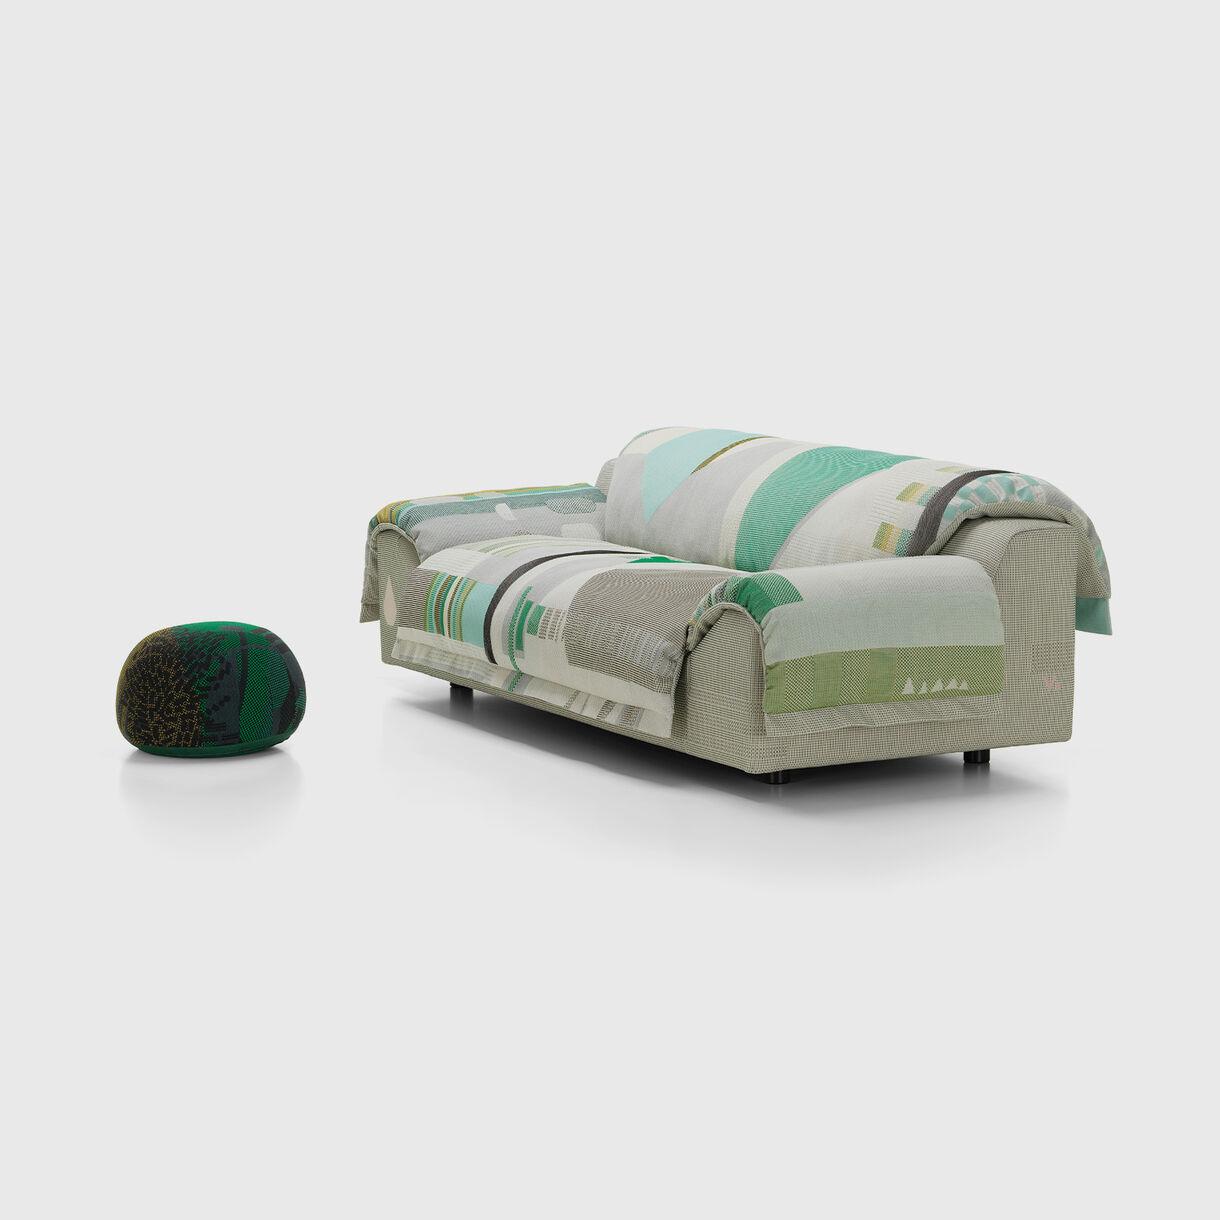 Vlinder Sofa, Light Greens with Bovist Ottoman, Dark Greens